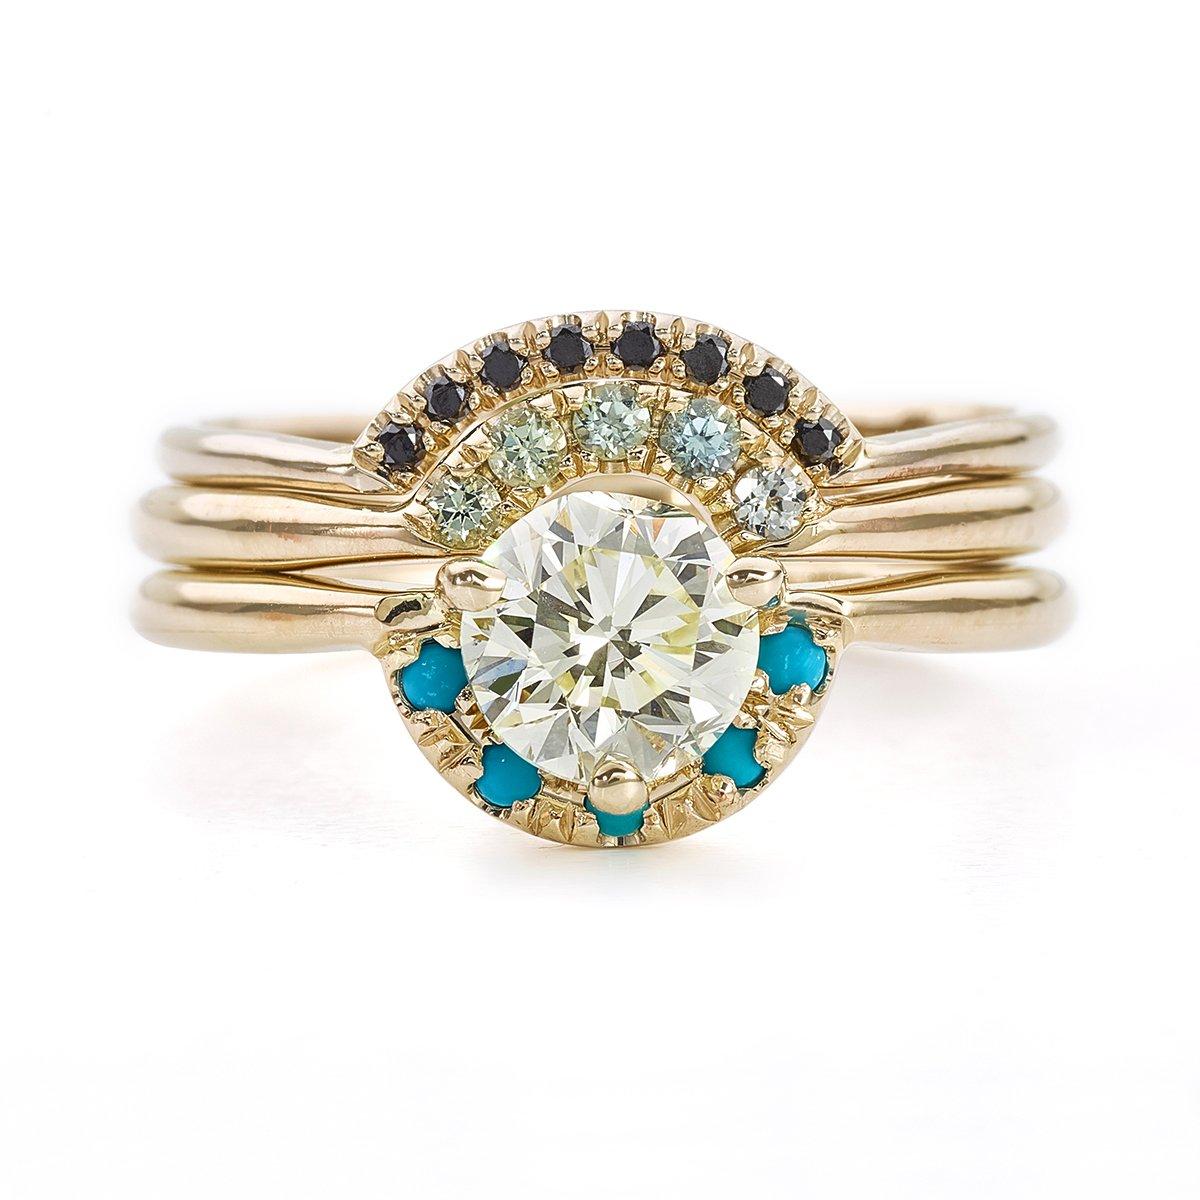 1dad11872cab4 Amazon.com: Boho Wedding Ring Set, Teal Sapphire Ring, One Carat ...